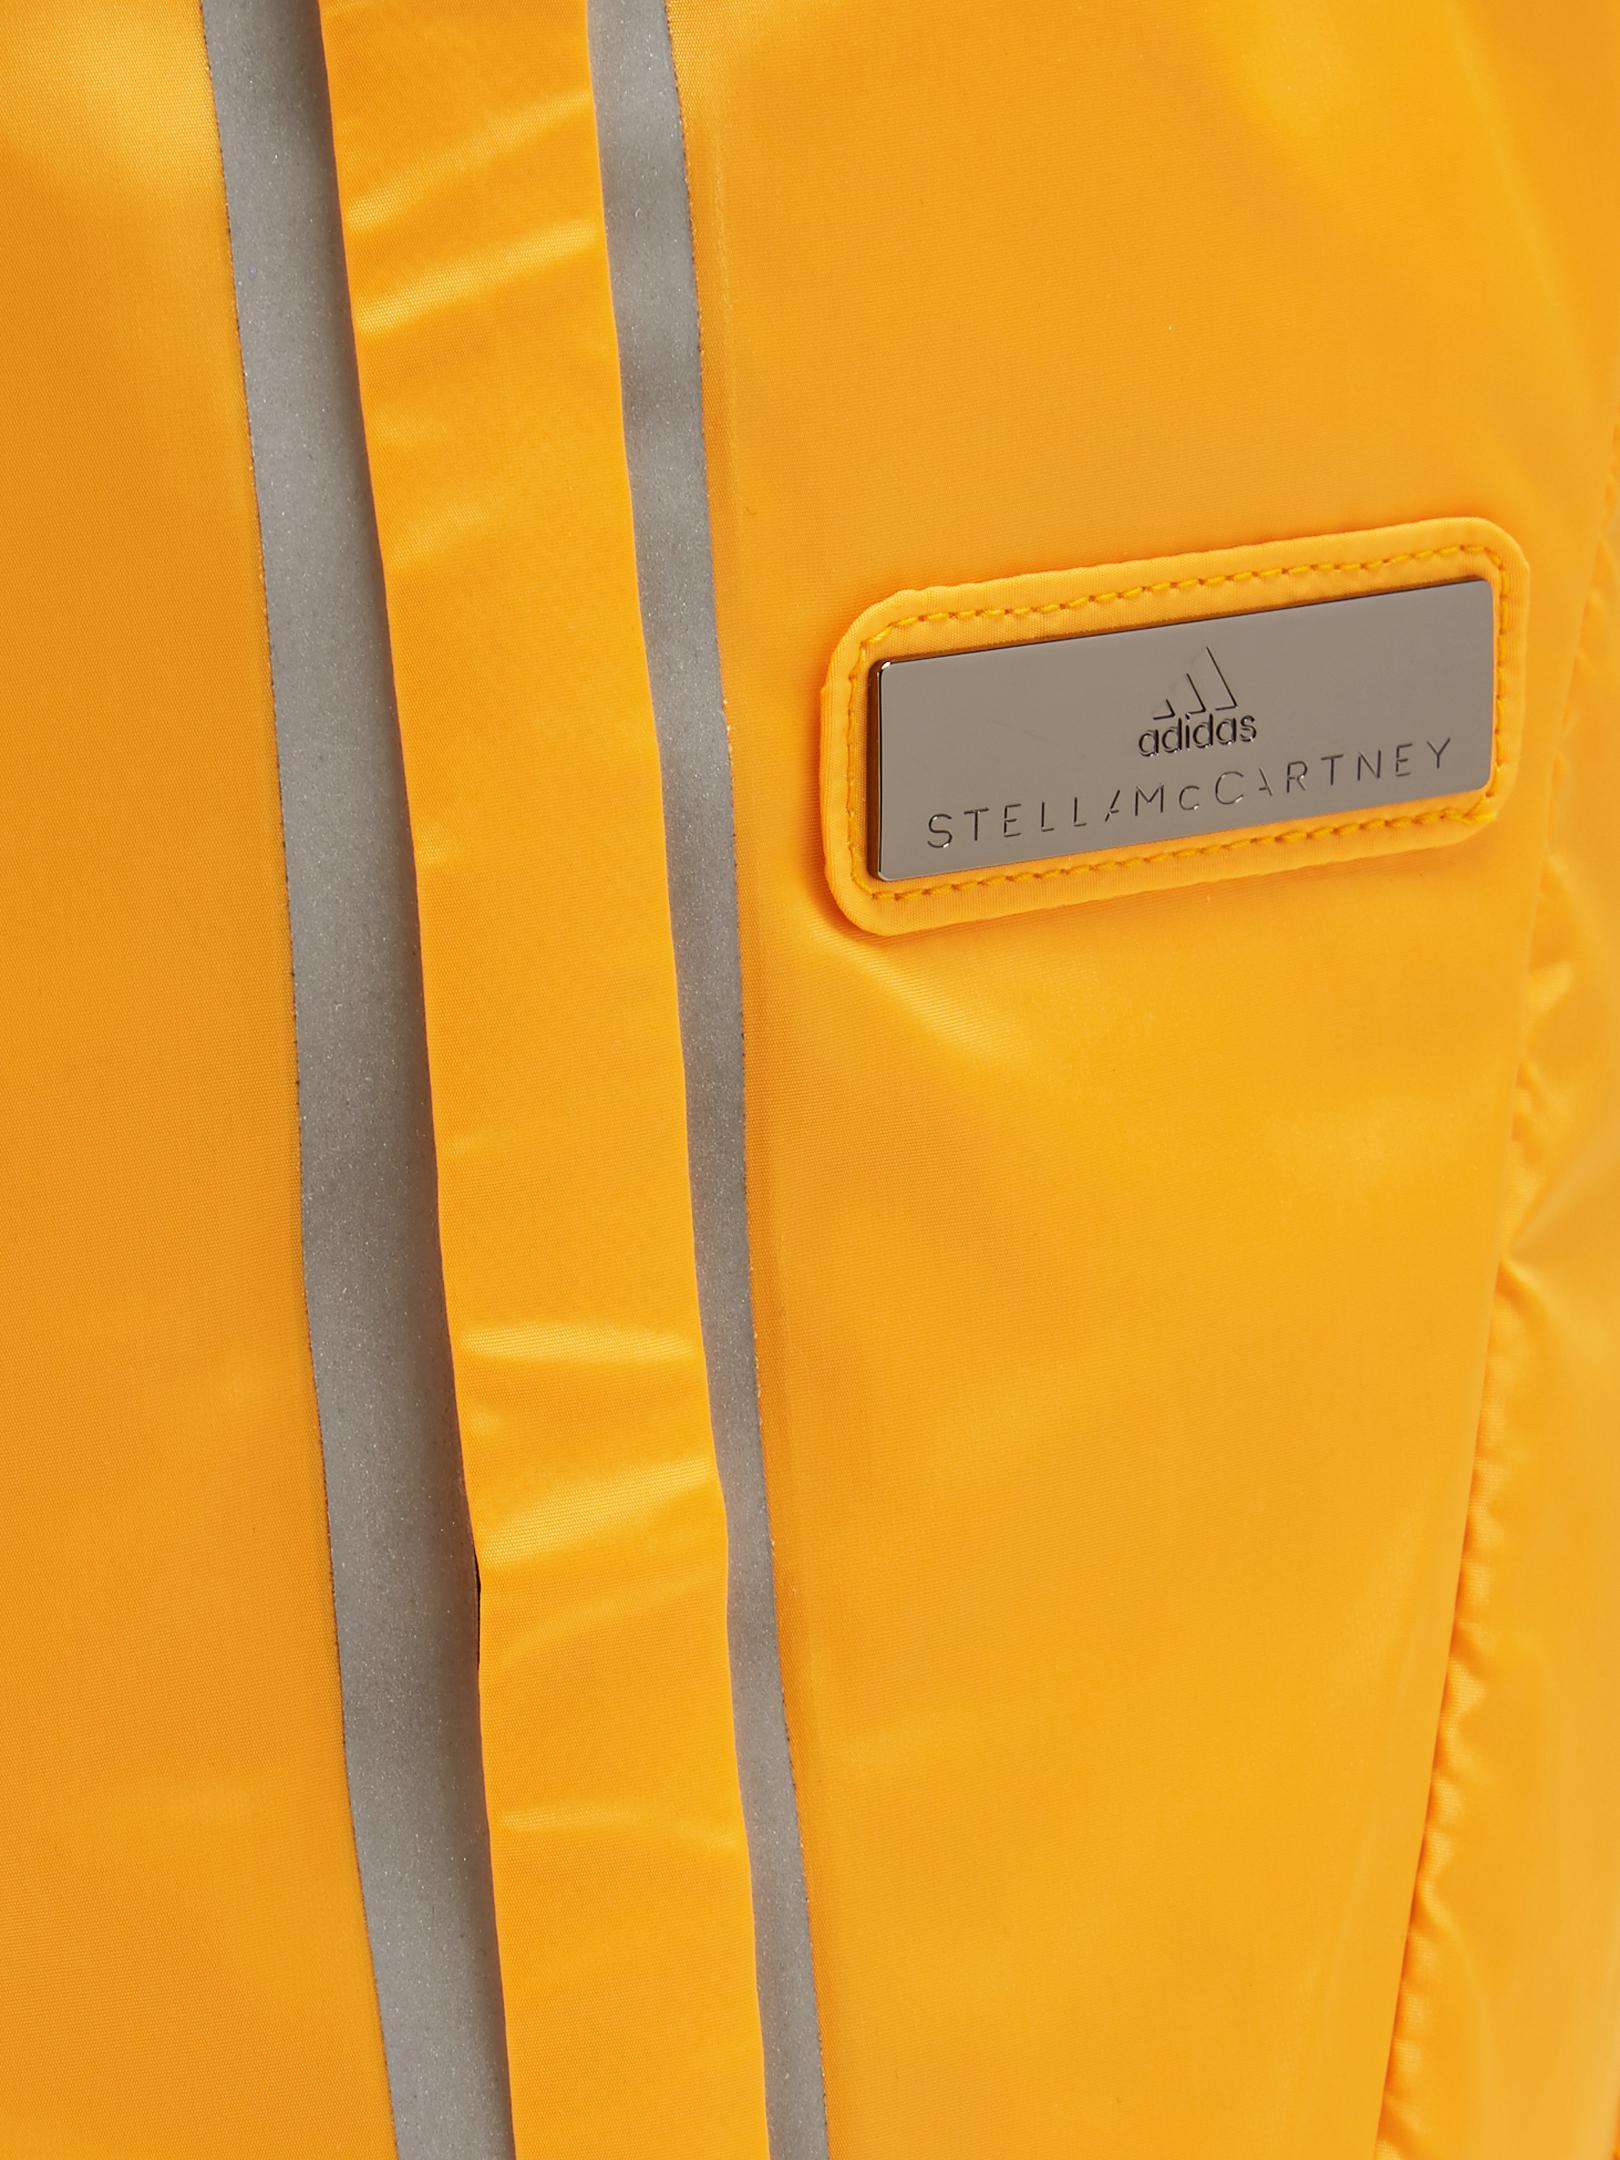 adidas by stella mccartney ORANGE Adizero Running Backpack